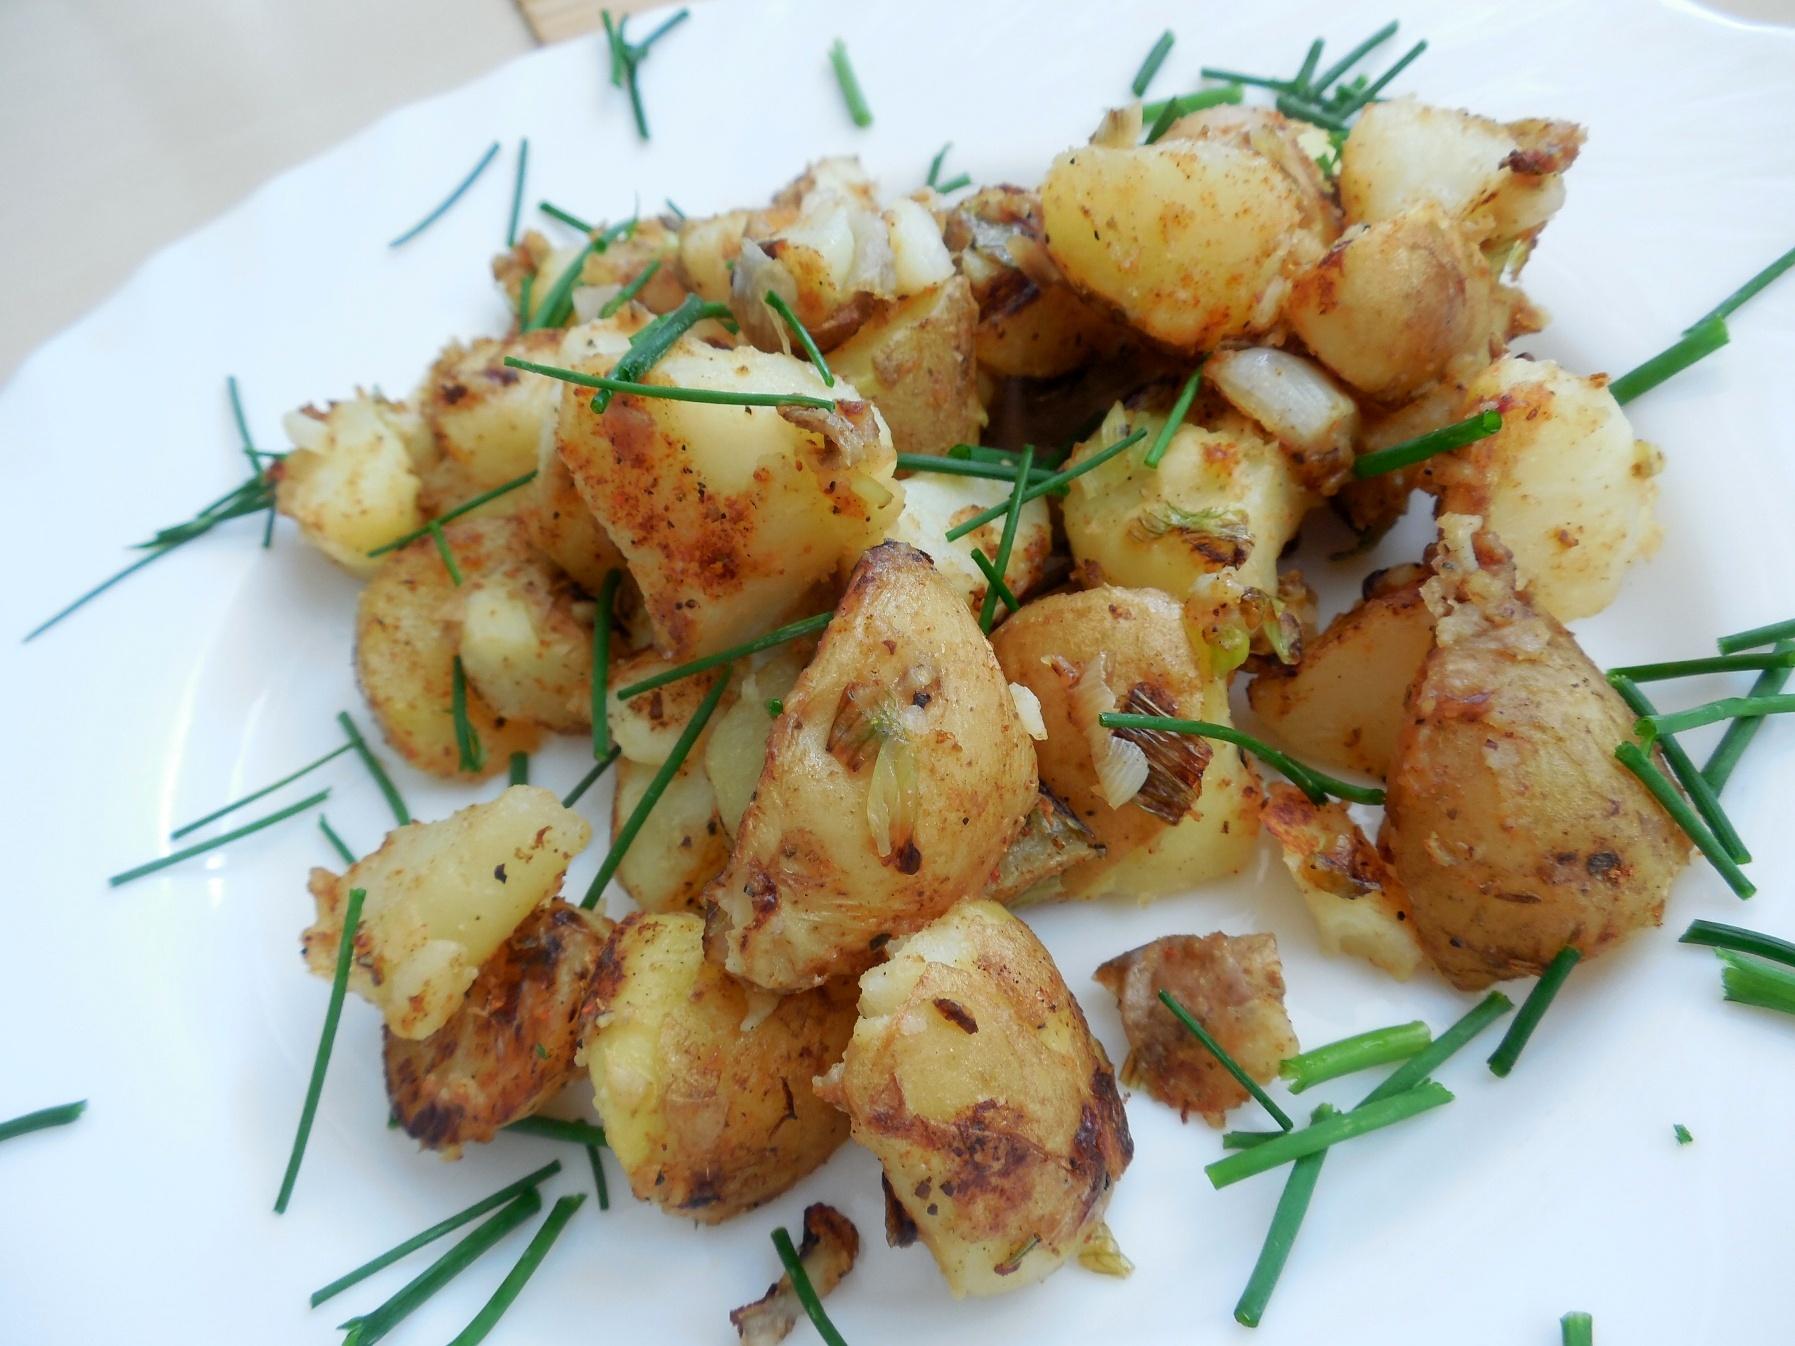 Fotografie receptu: Opékané nové brambory na cibulce